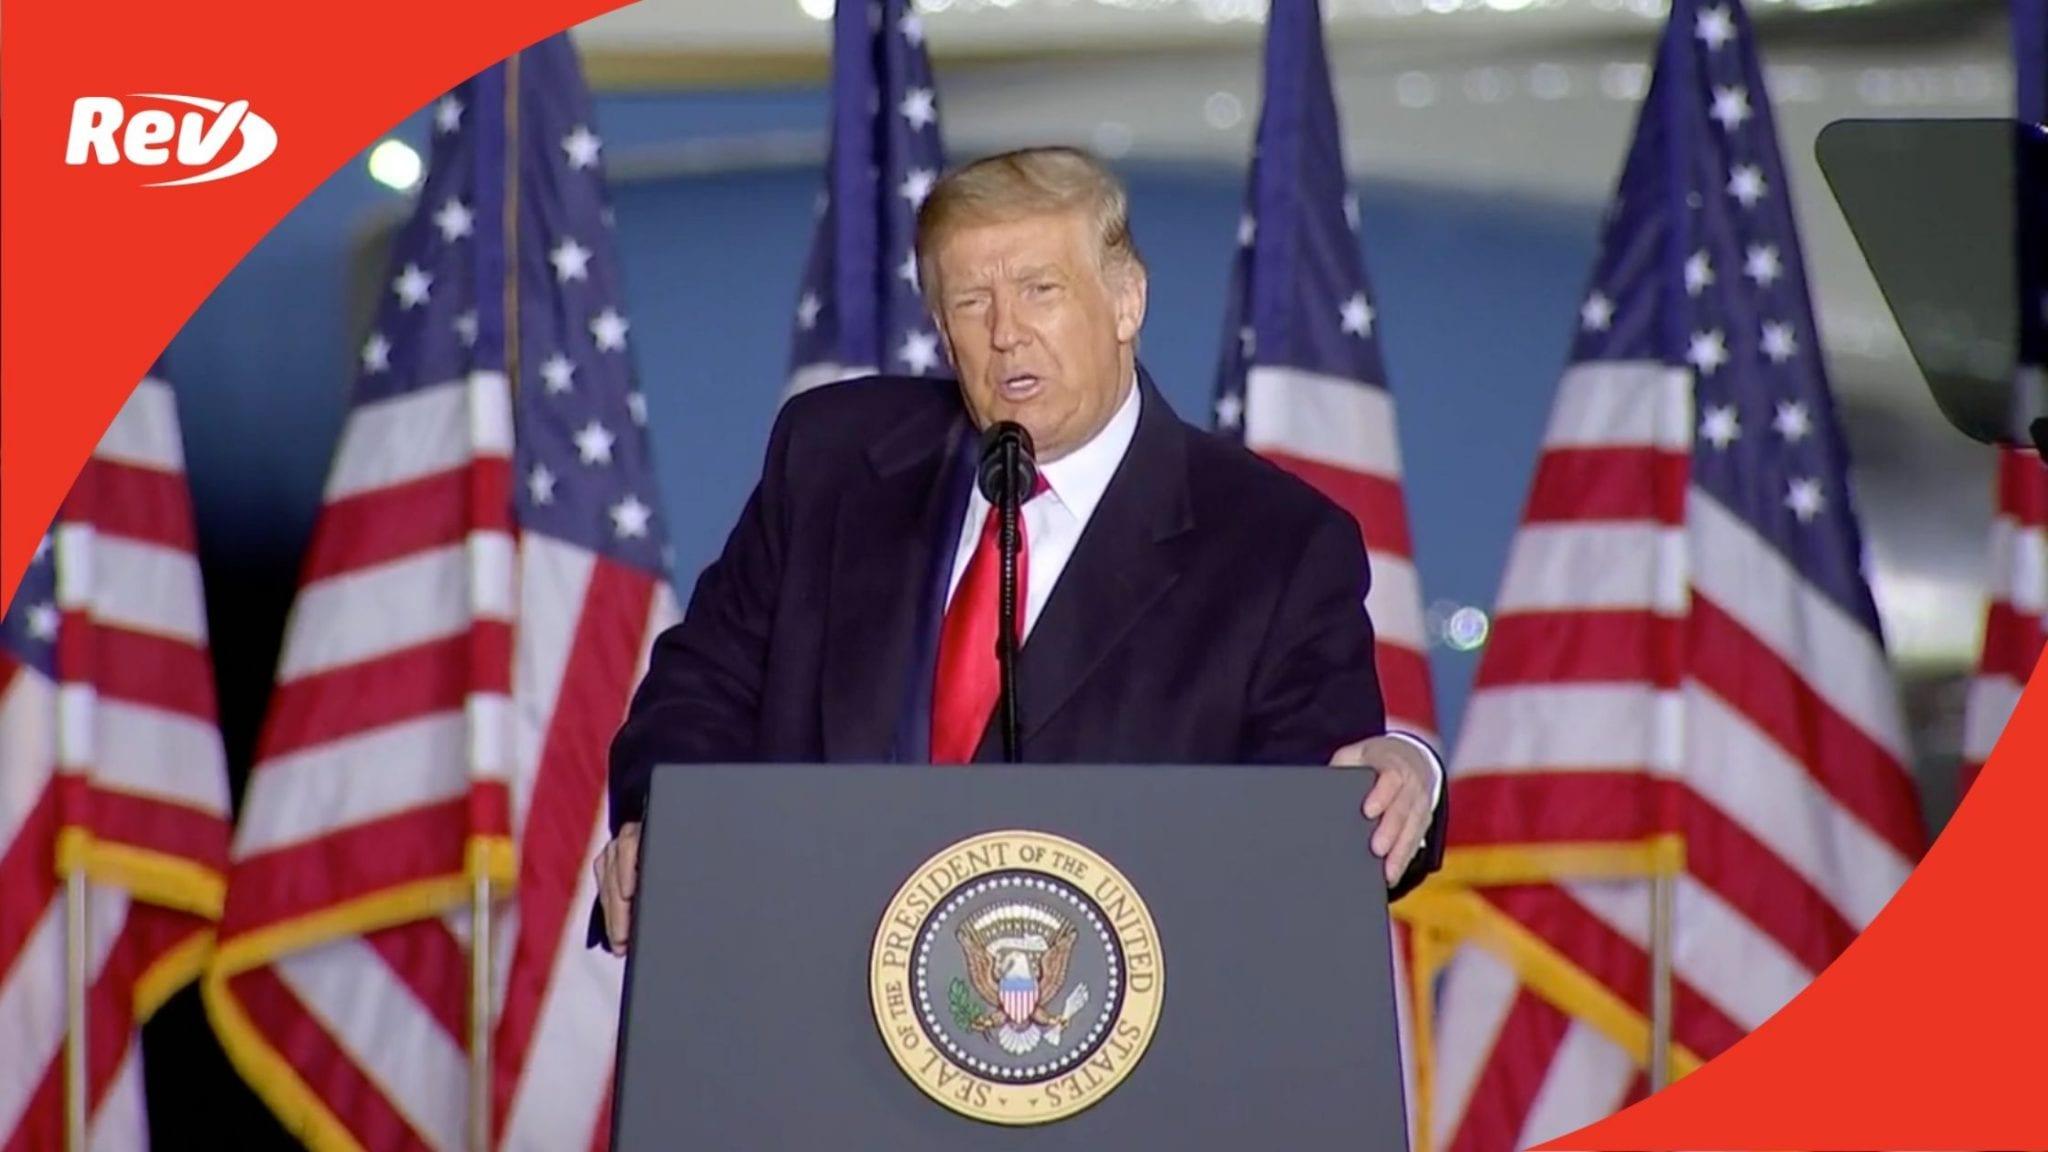 Donald Trump Mosinee, WI Rally Speech Transcript September 17